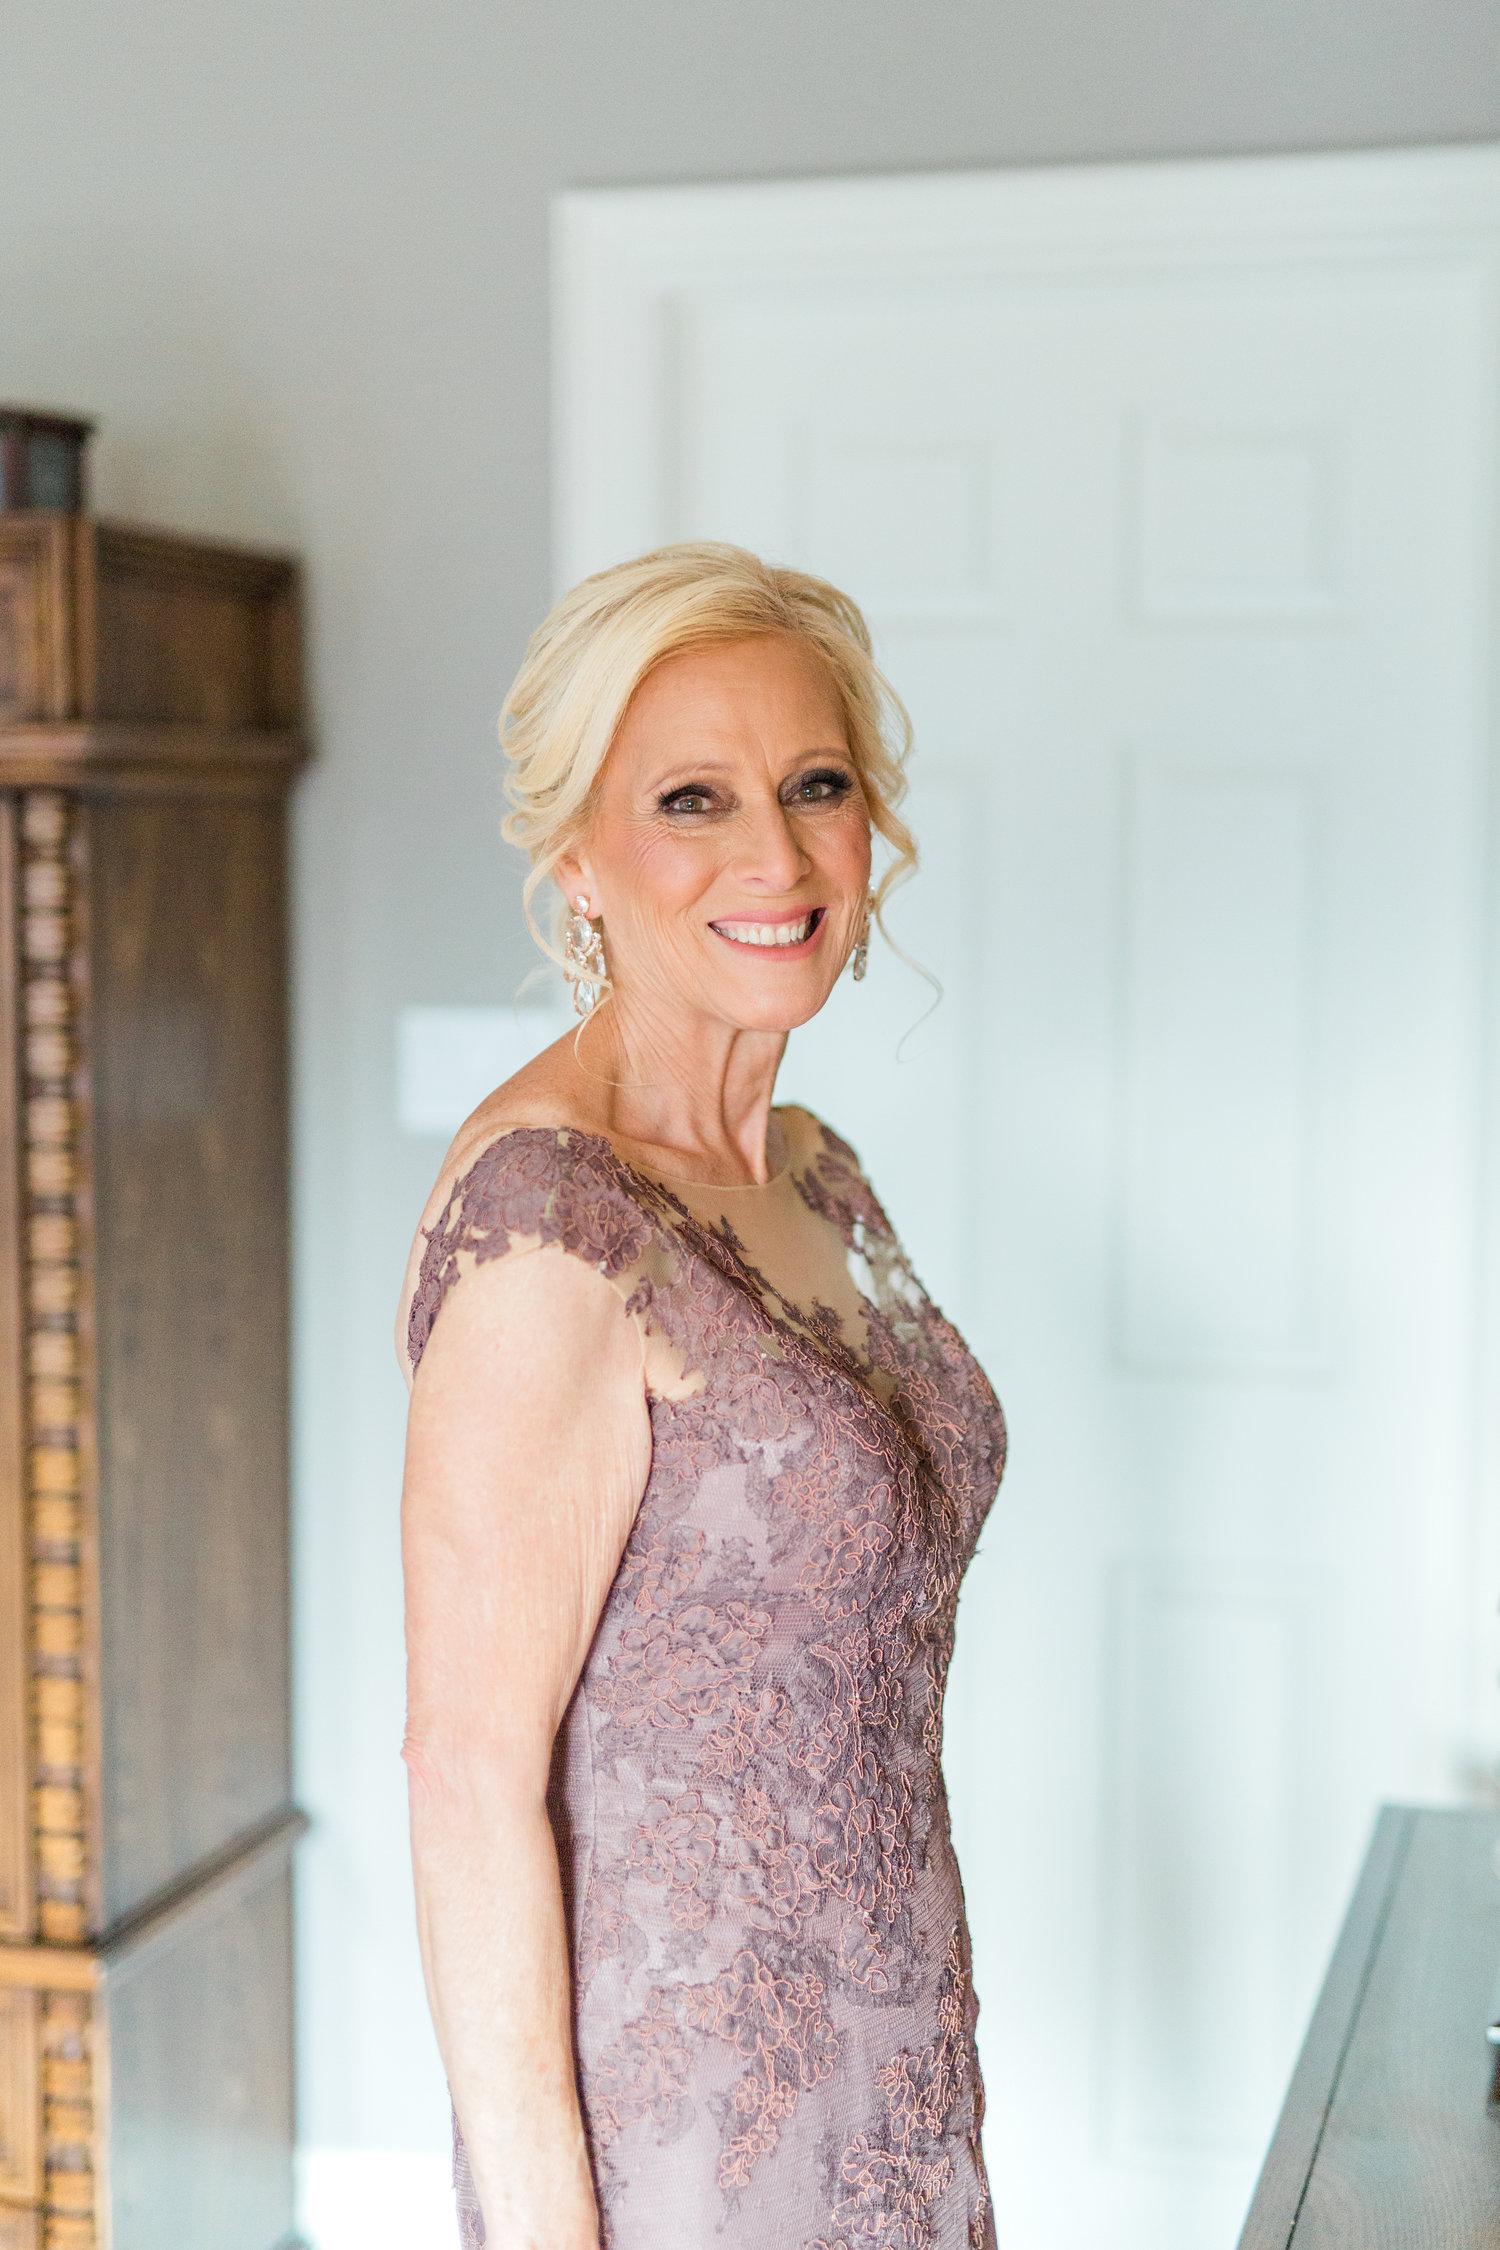 Danielle-Giroux-Amir-Golbazi-Toronto-Wedding-Photographer-Bellvue-Manor_DeLuca_1-018.jpg